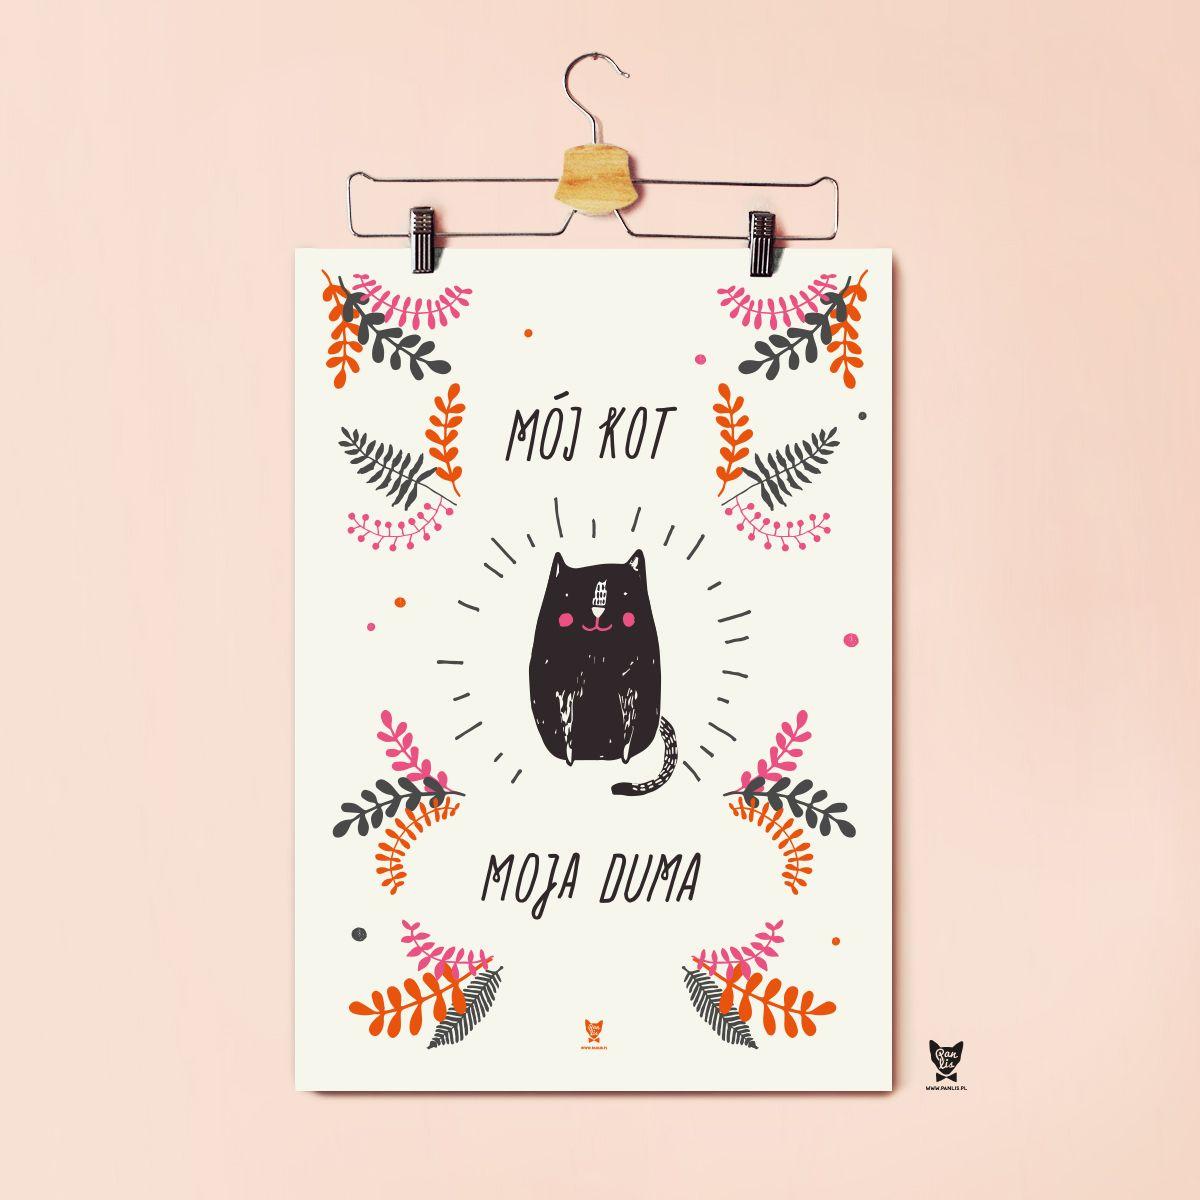 Plakat Dla Posiadaczy Kotow Moj Kot Moja Duma Wall Decor